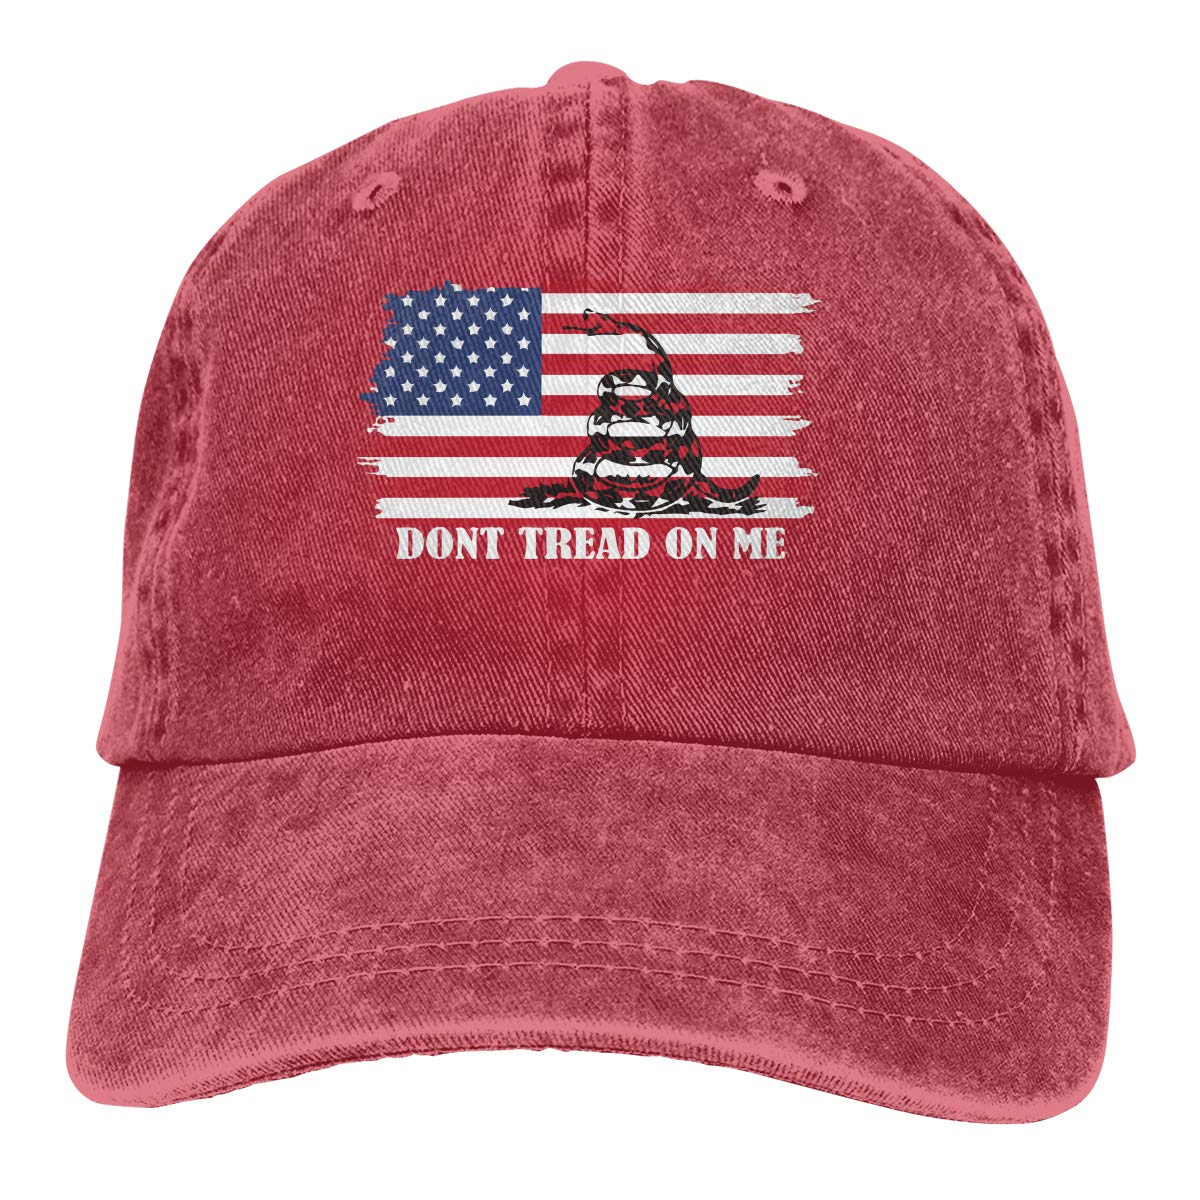 Men Women Vintage Denim Fabric Baseball Cap Dont Tread On Me Plain Cap